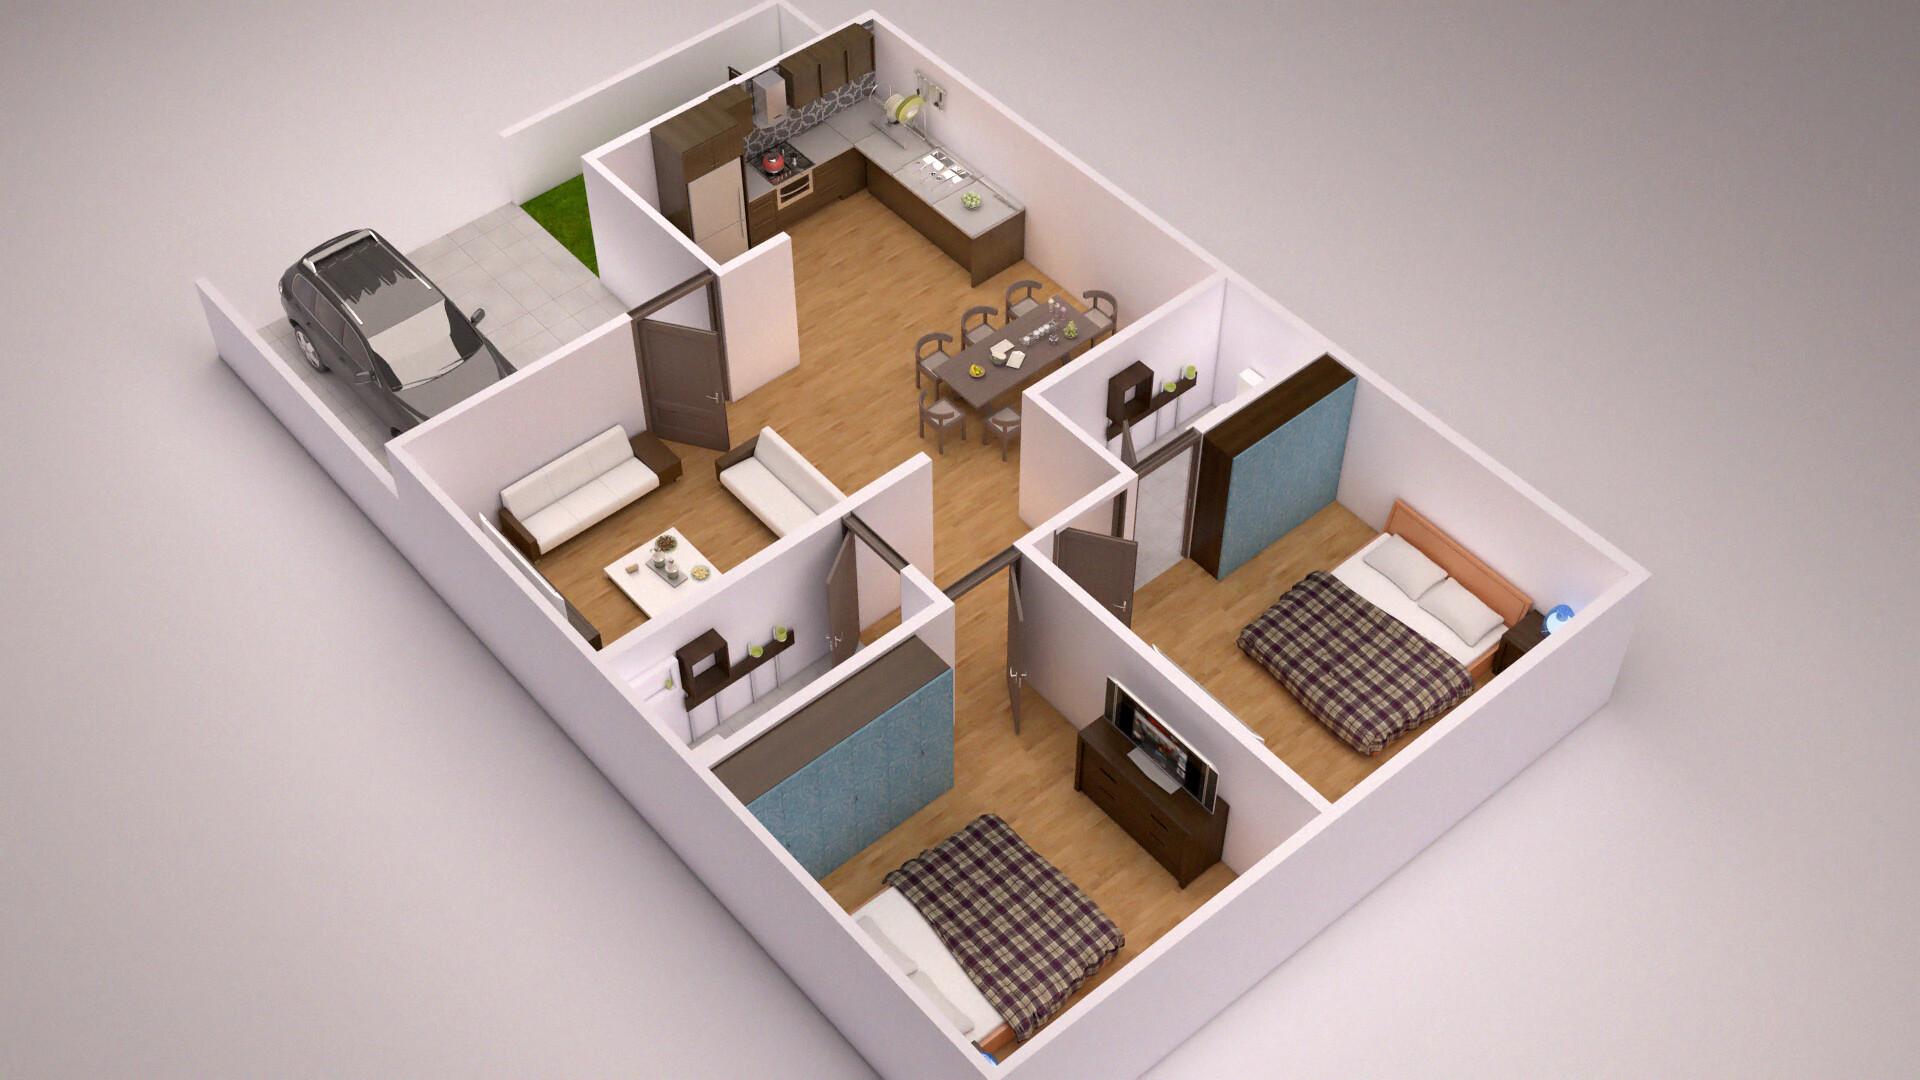 Artstation 3d Floor Plan 2bhk Rohit Kushwaha